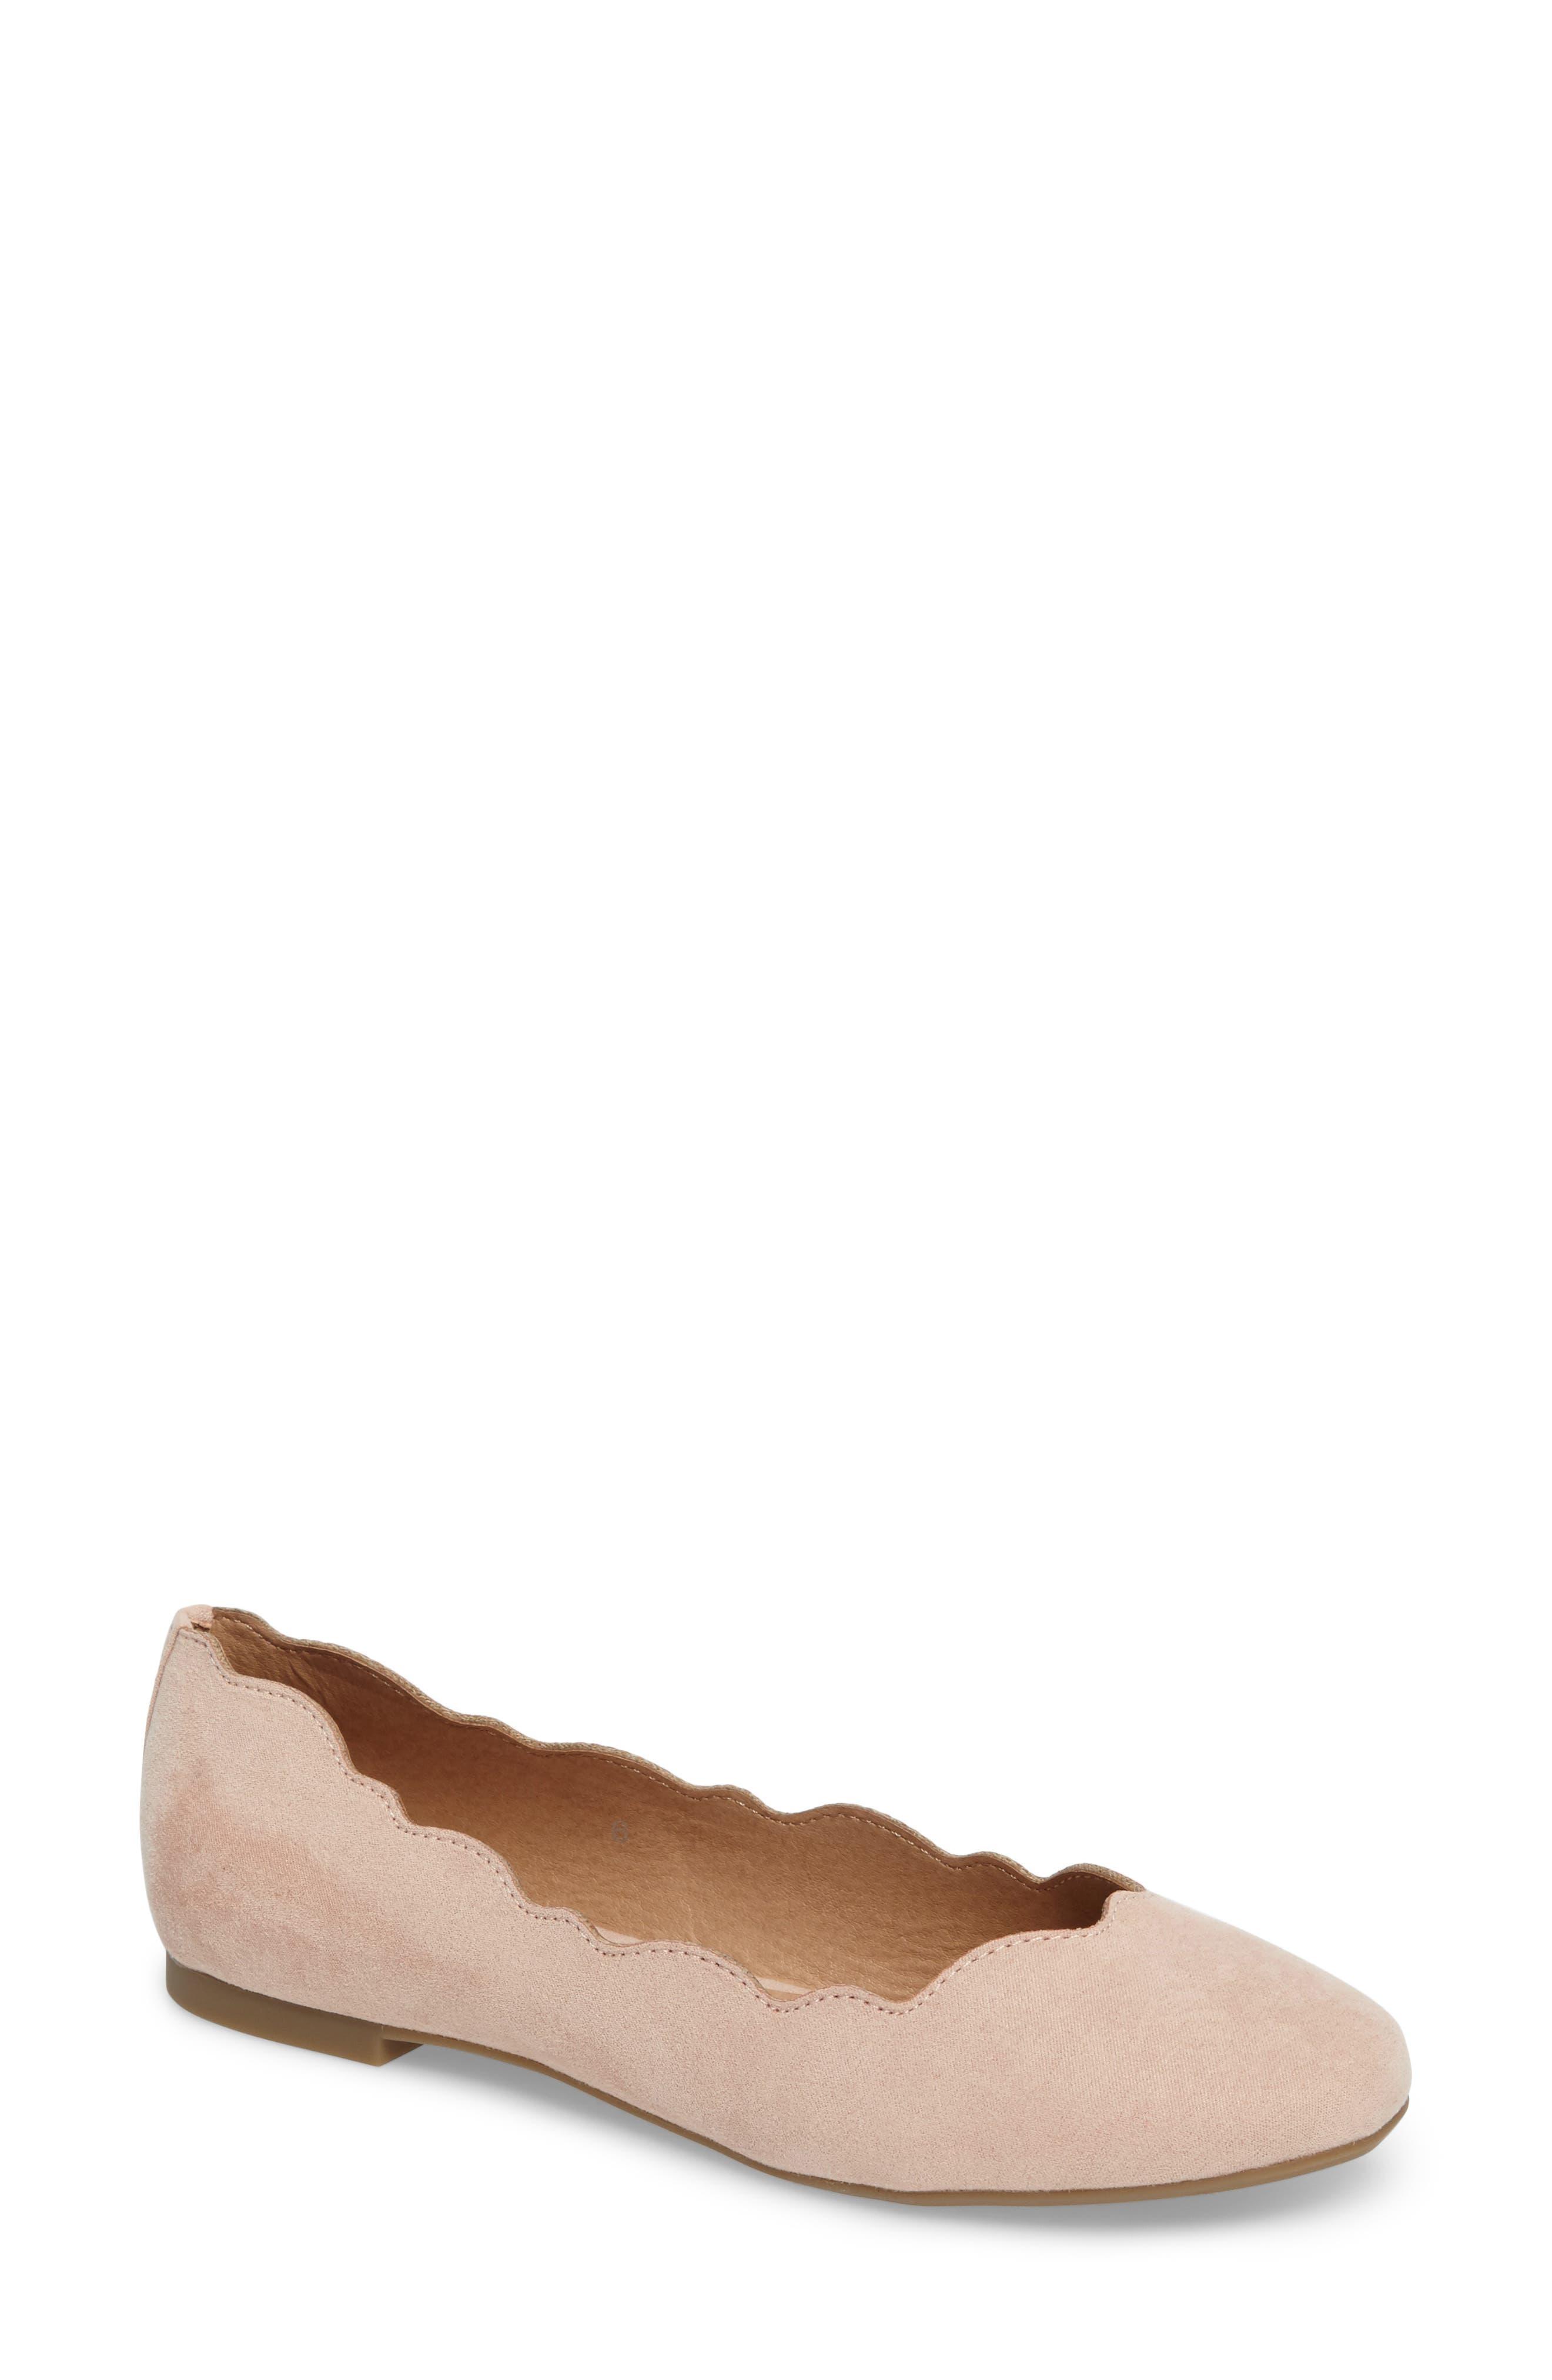 Athena Alexander Tallye Ballet Flat (Women)